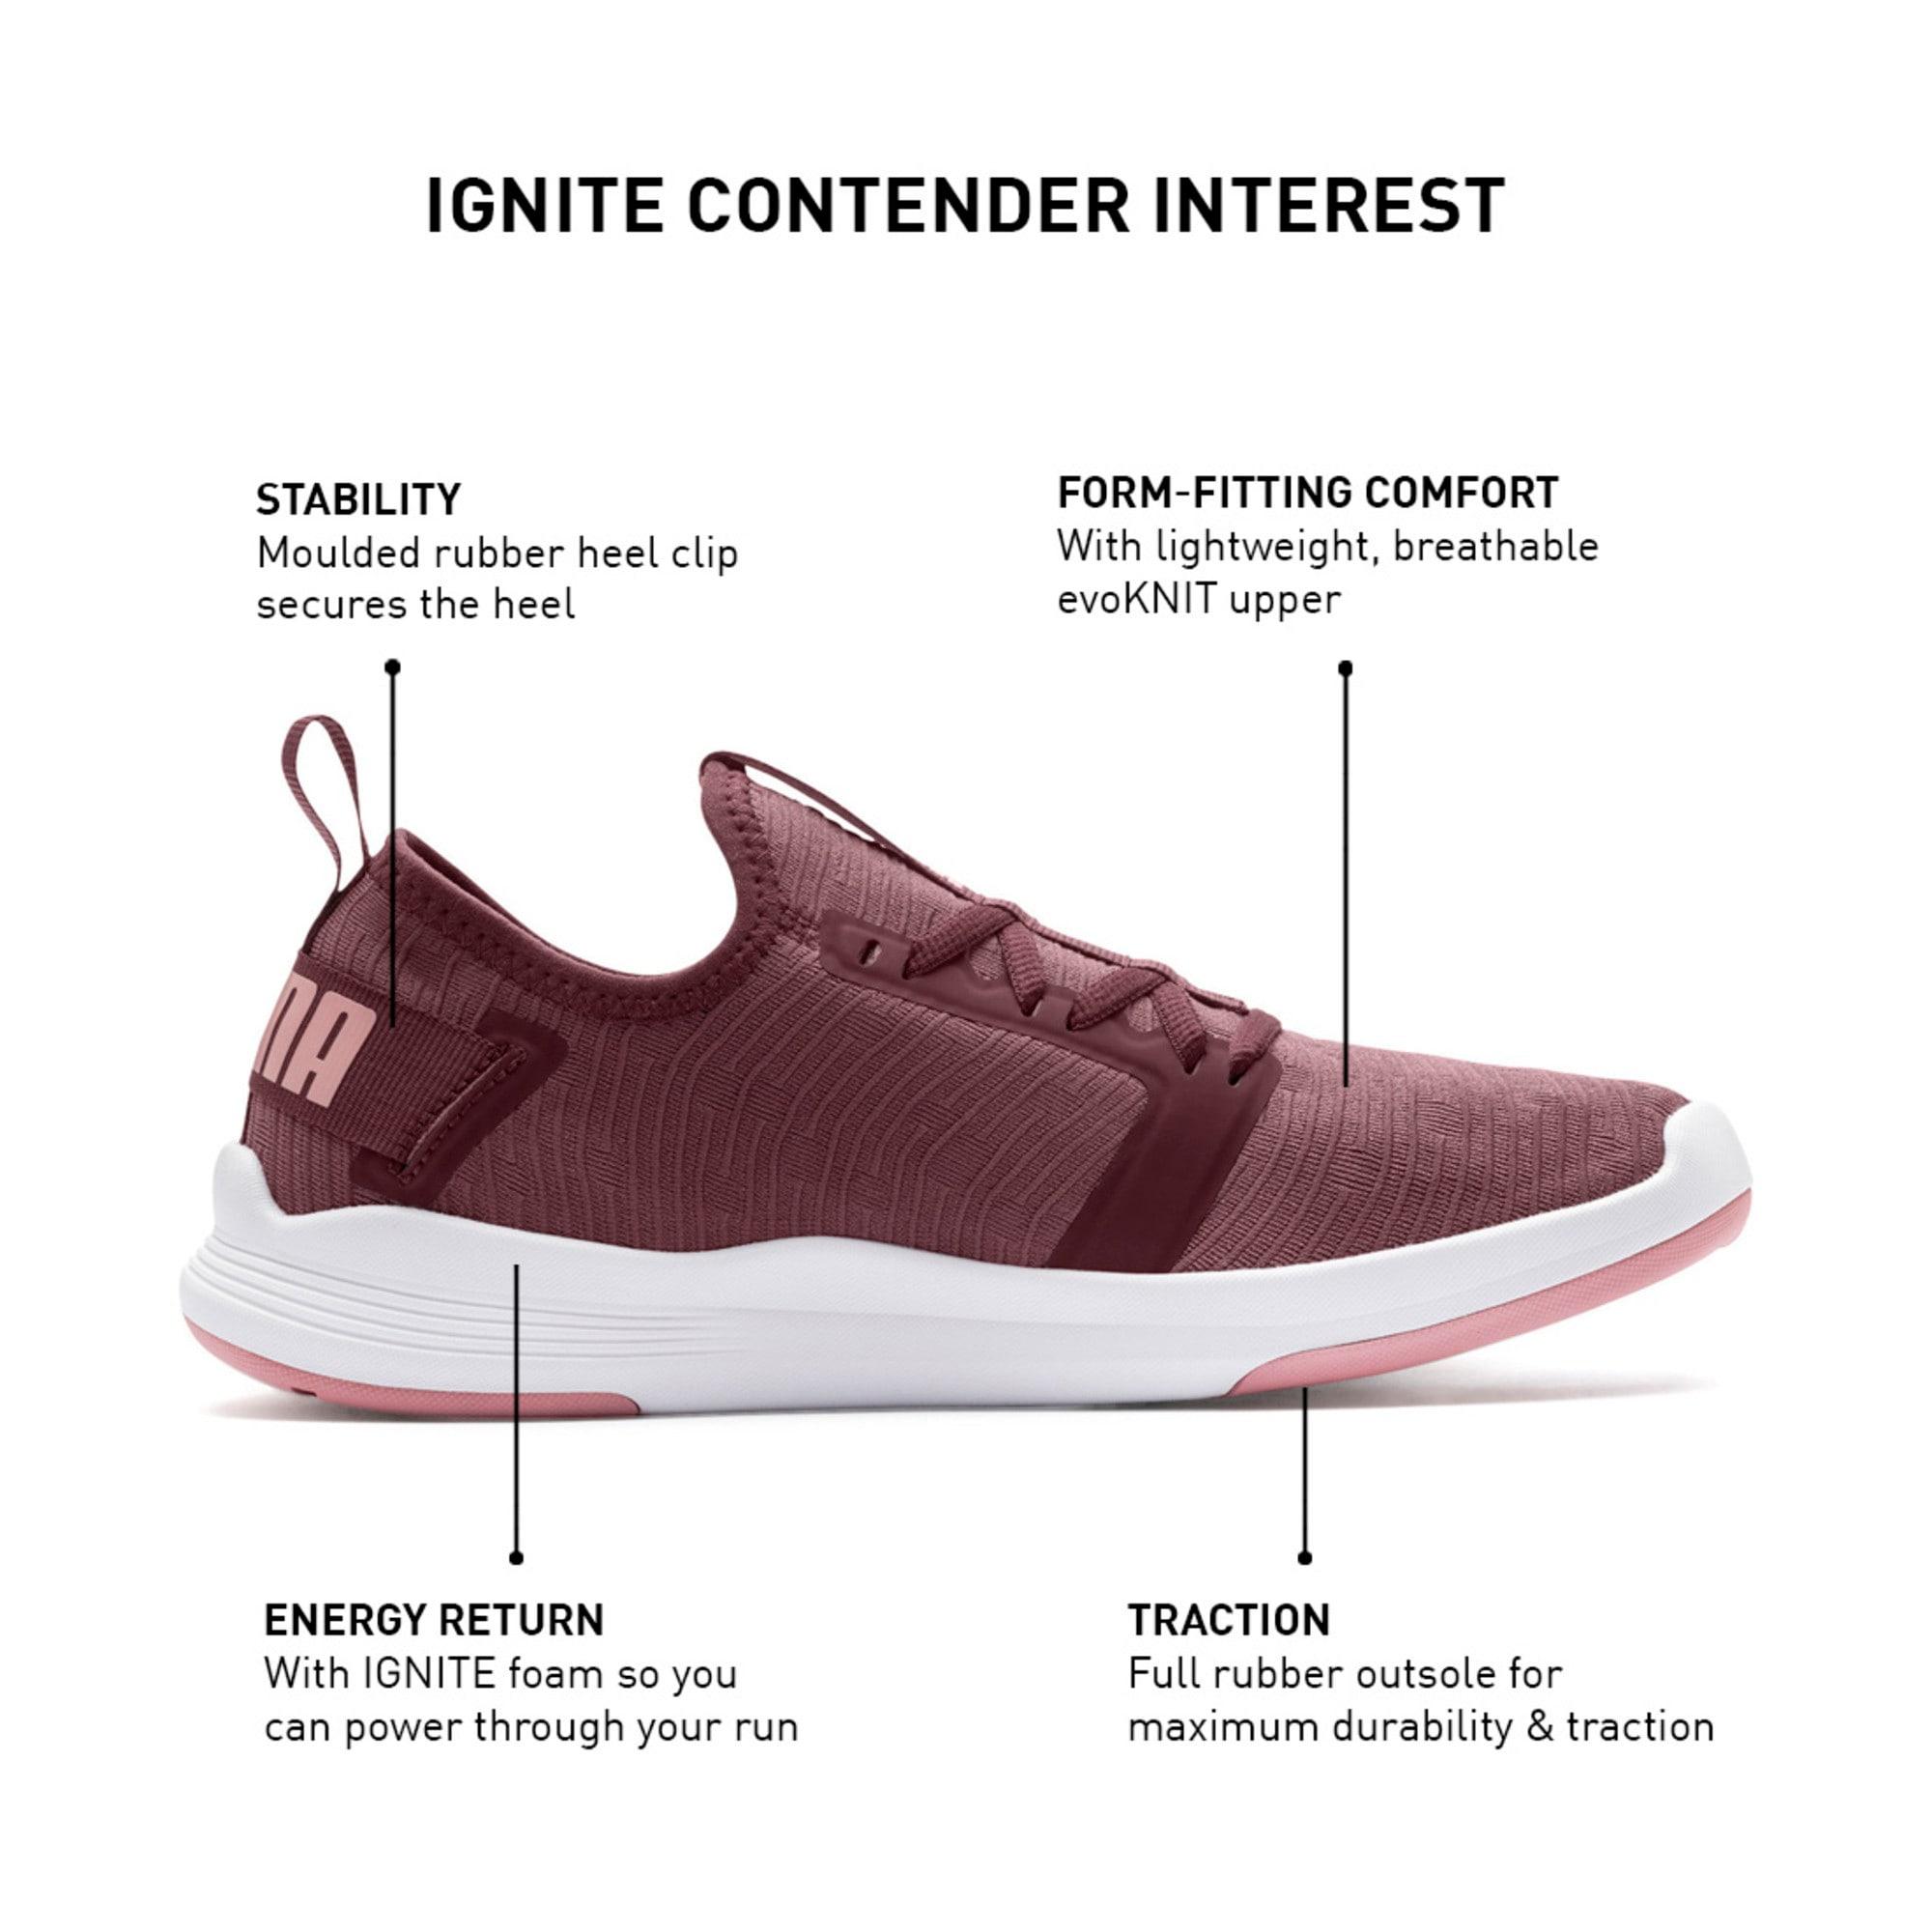 Thumbnail 9 of IGNITE Contender Interest Women's Trainers, Vineyard Wine-Bridal Rose, medium-IND